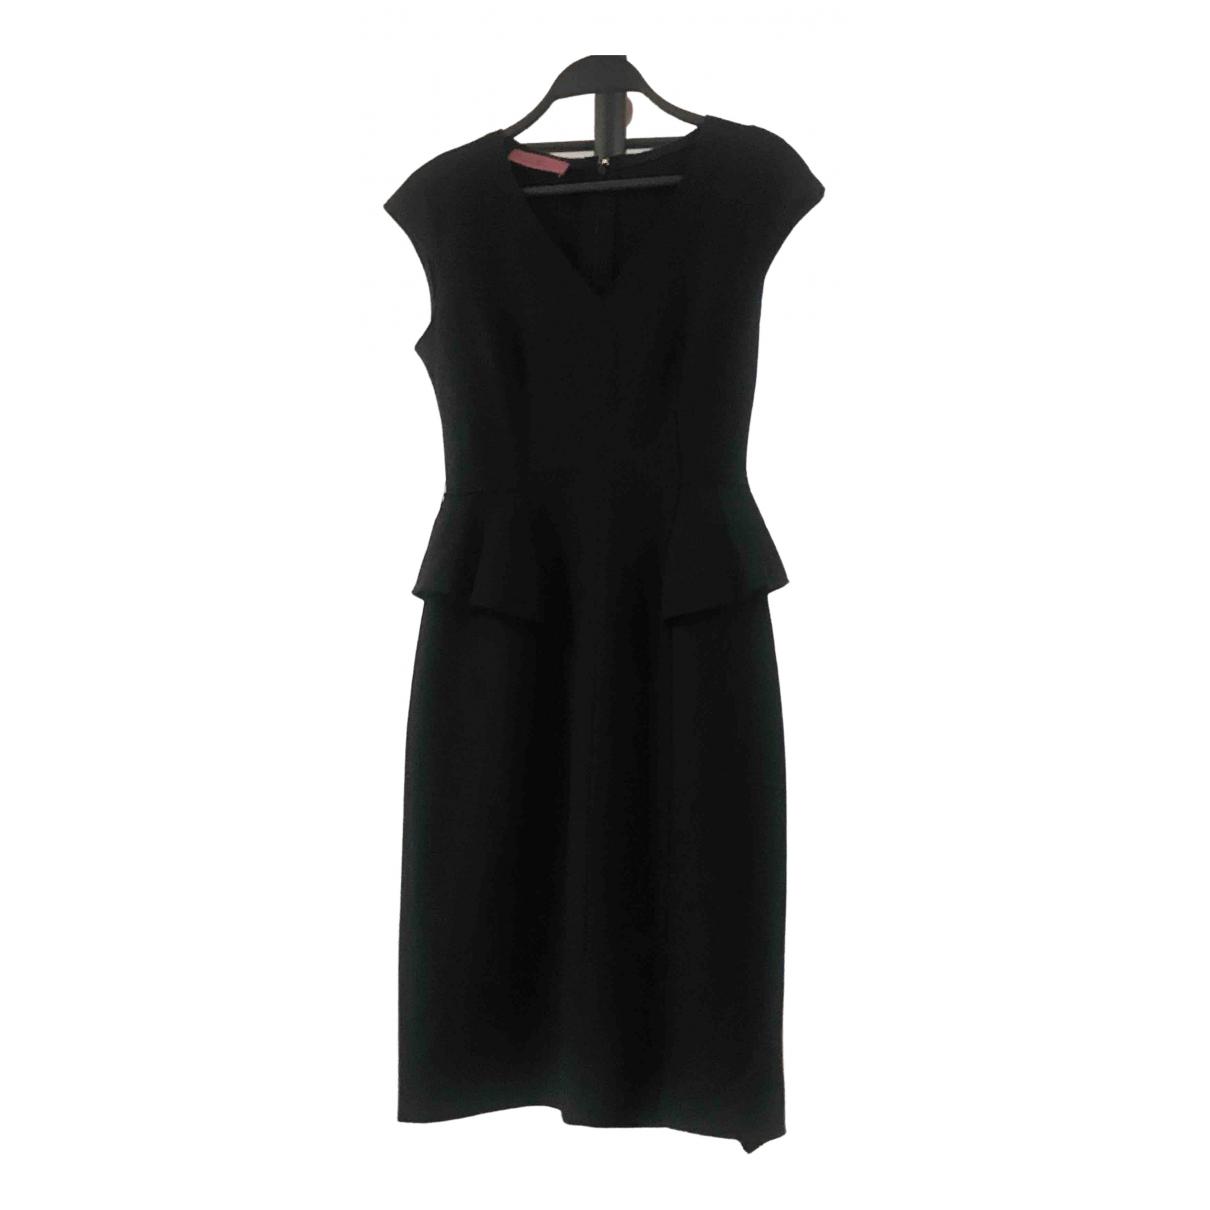 Carolina Herrera N Black Wool dress for Women 4 US